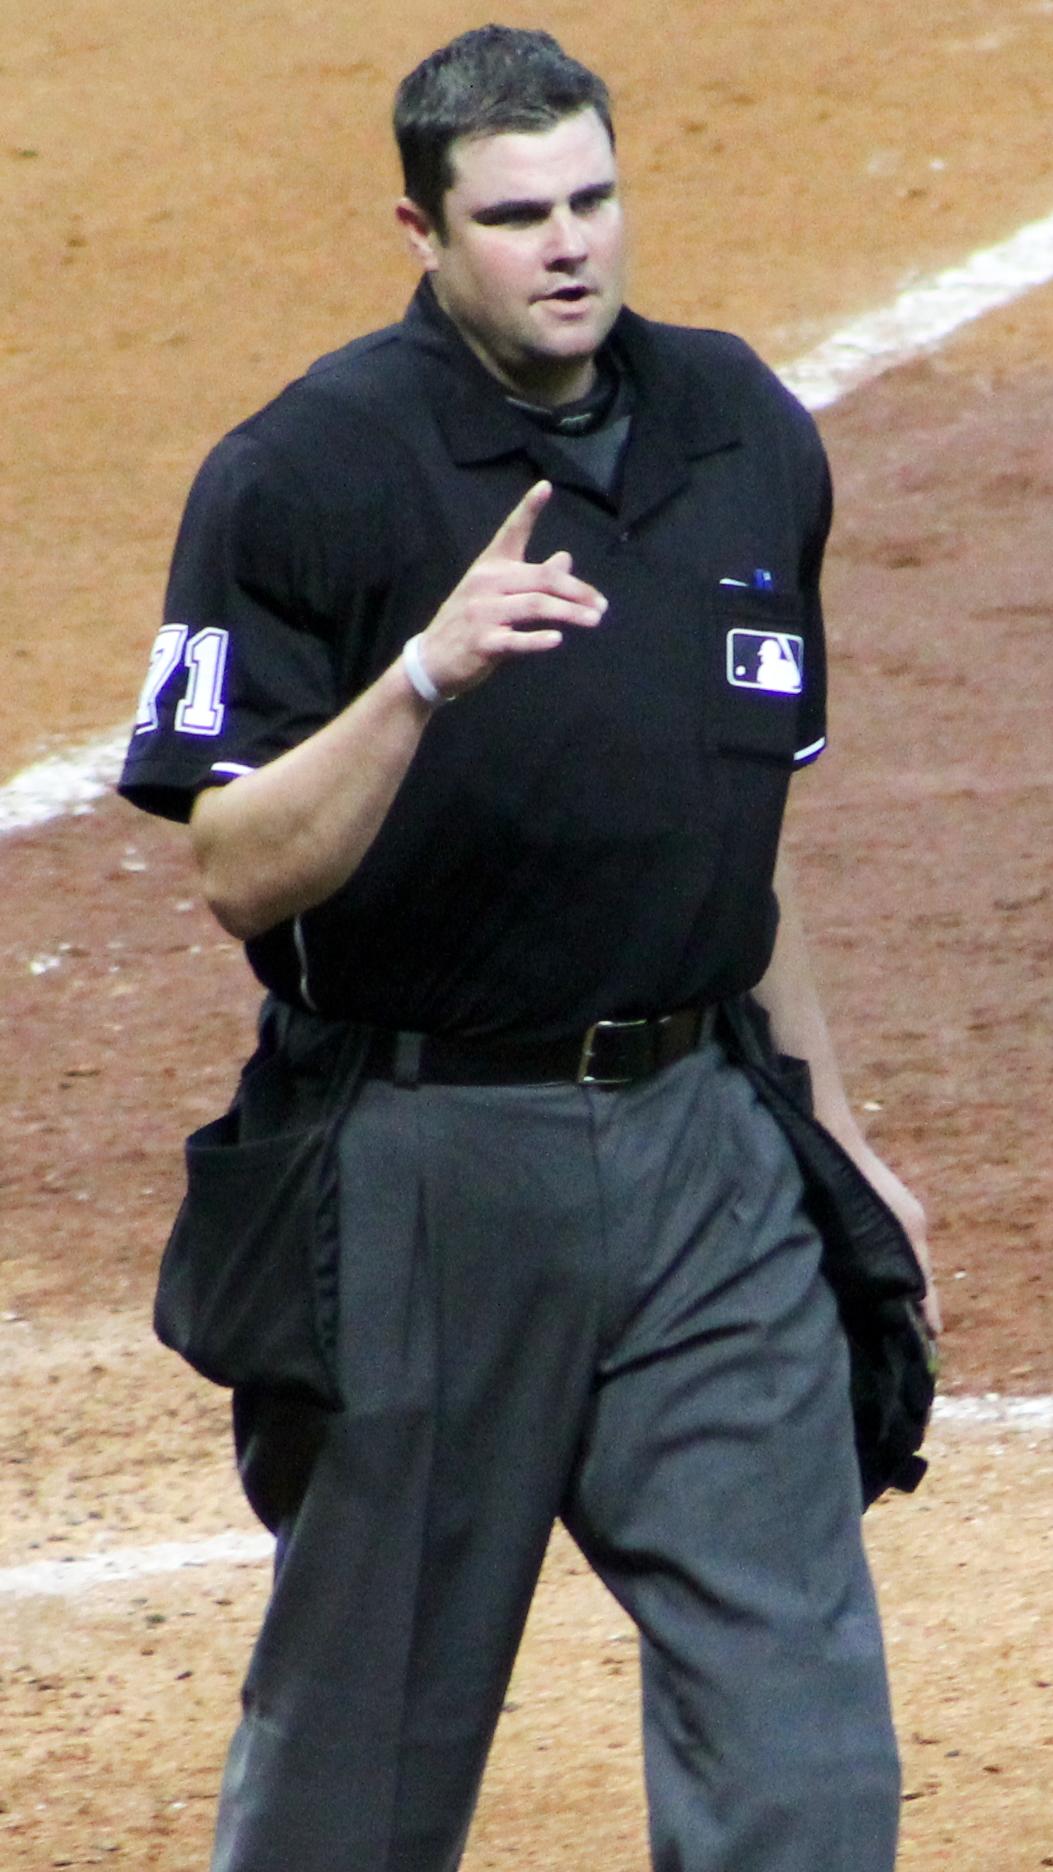 Jordan Baker Umpire Wikipedia